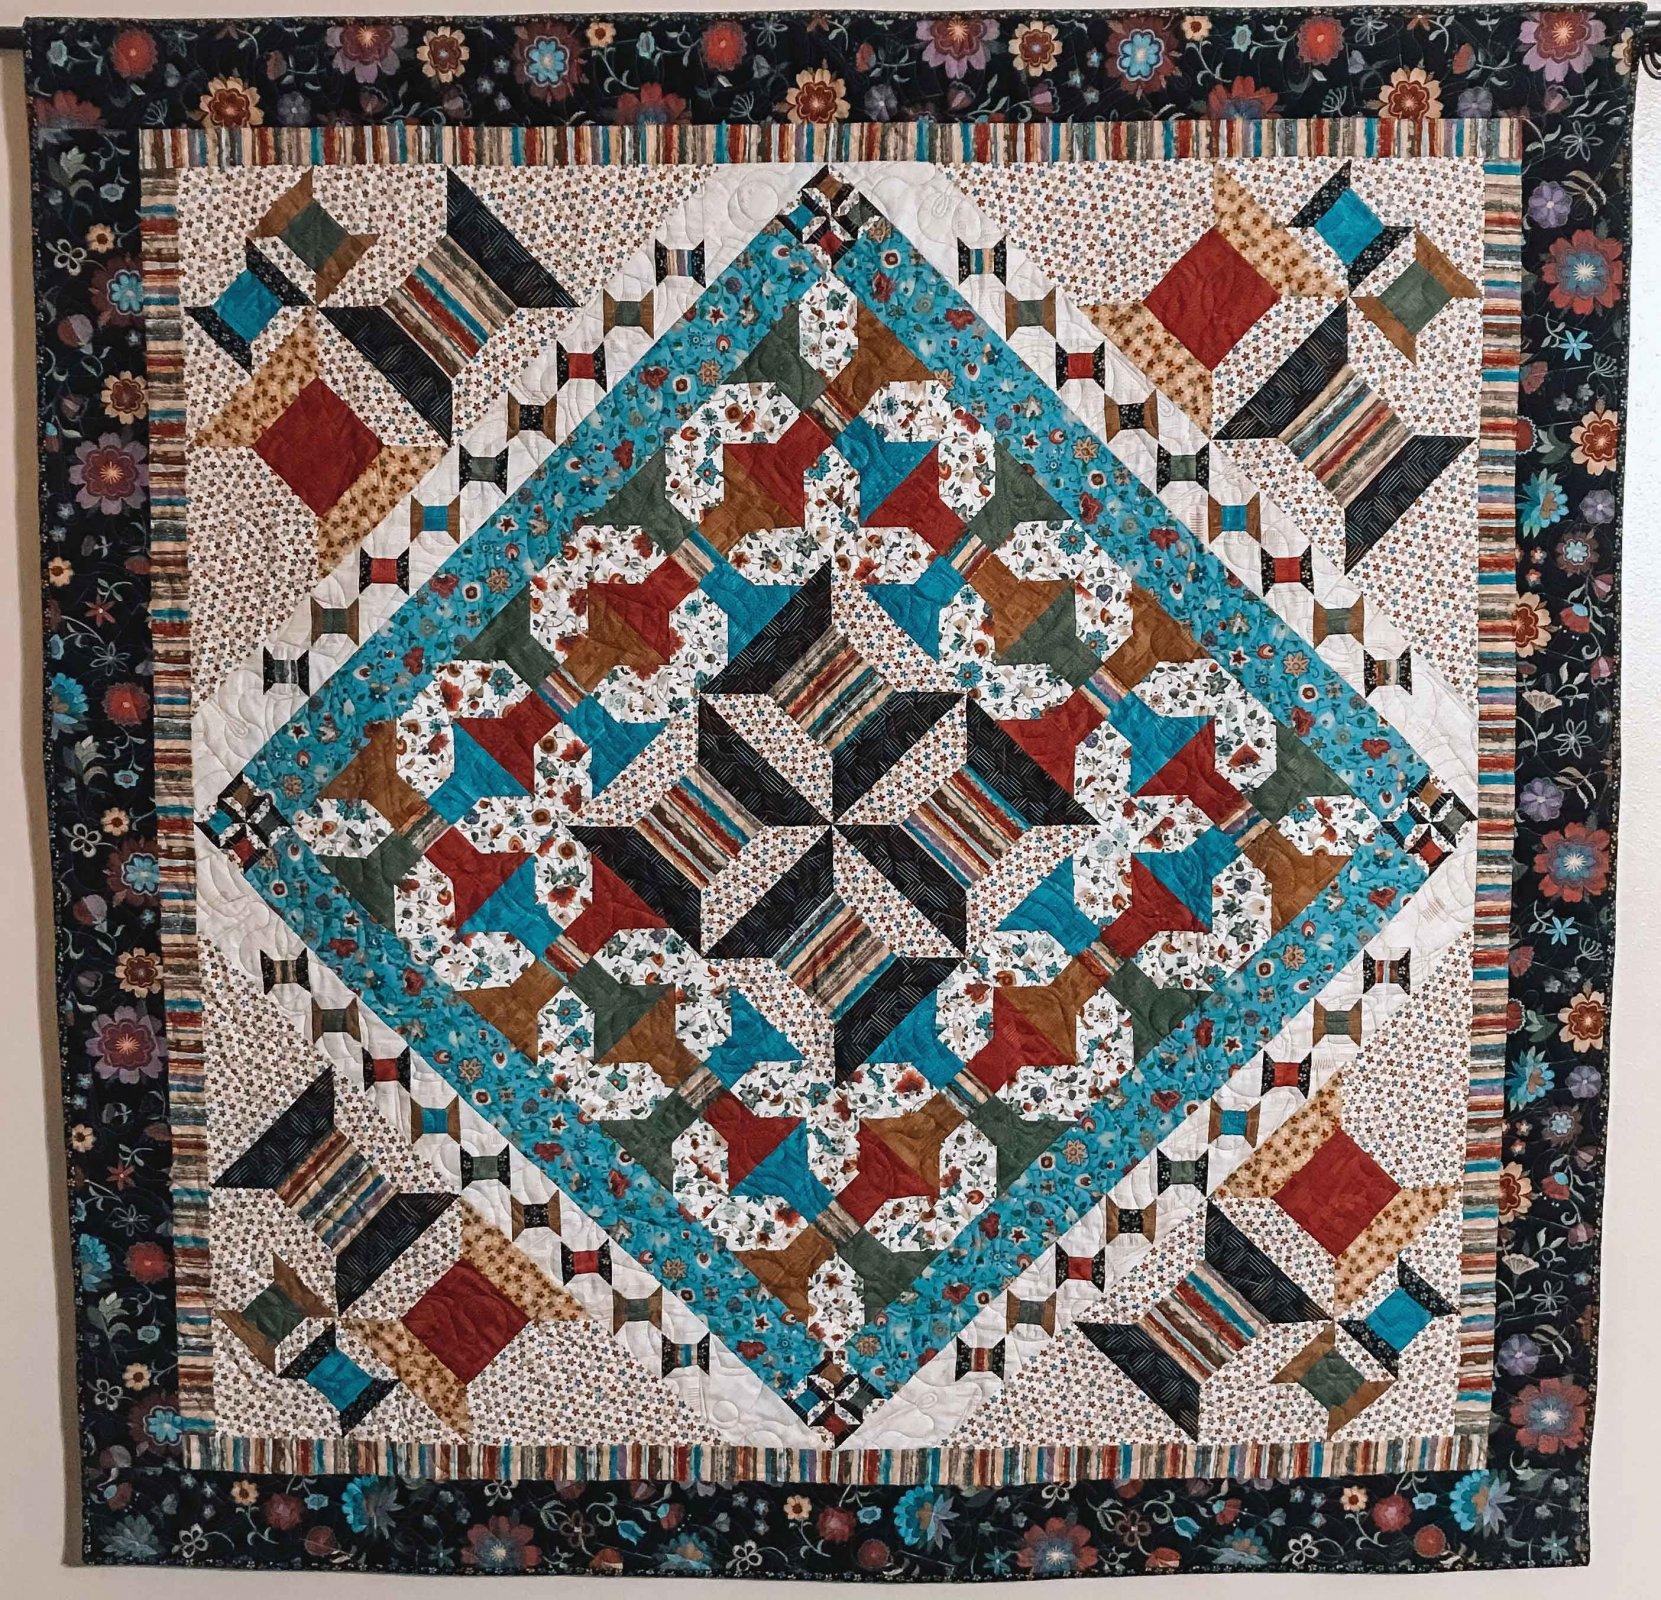 Threaded Spools quilt kit